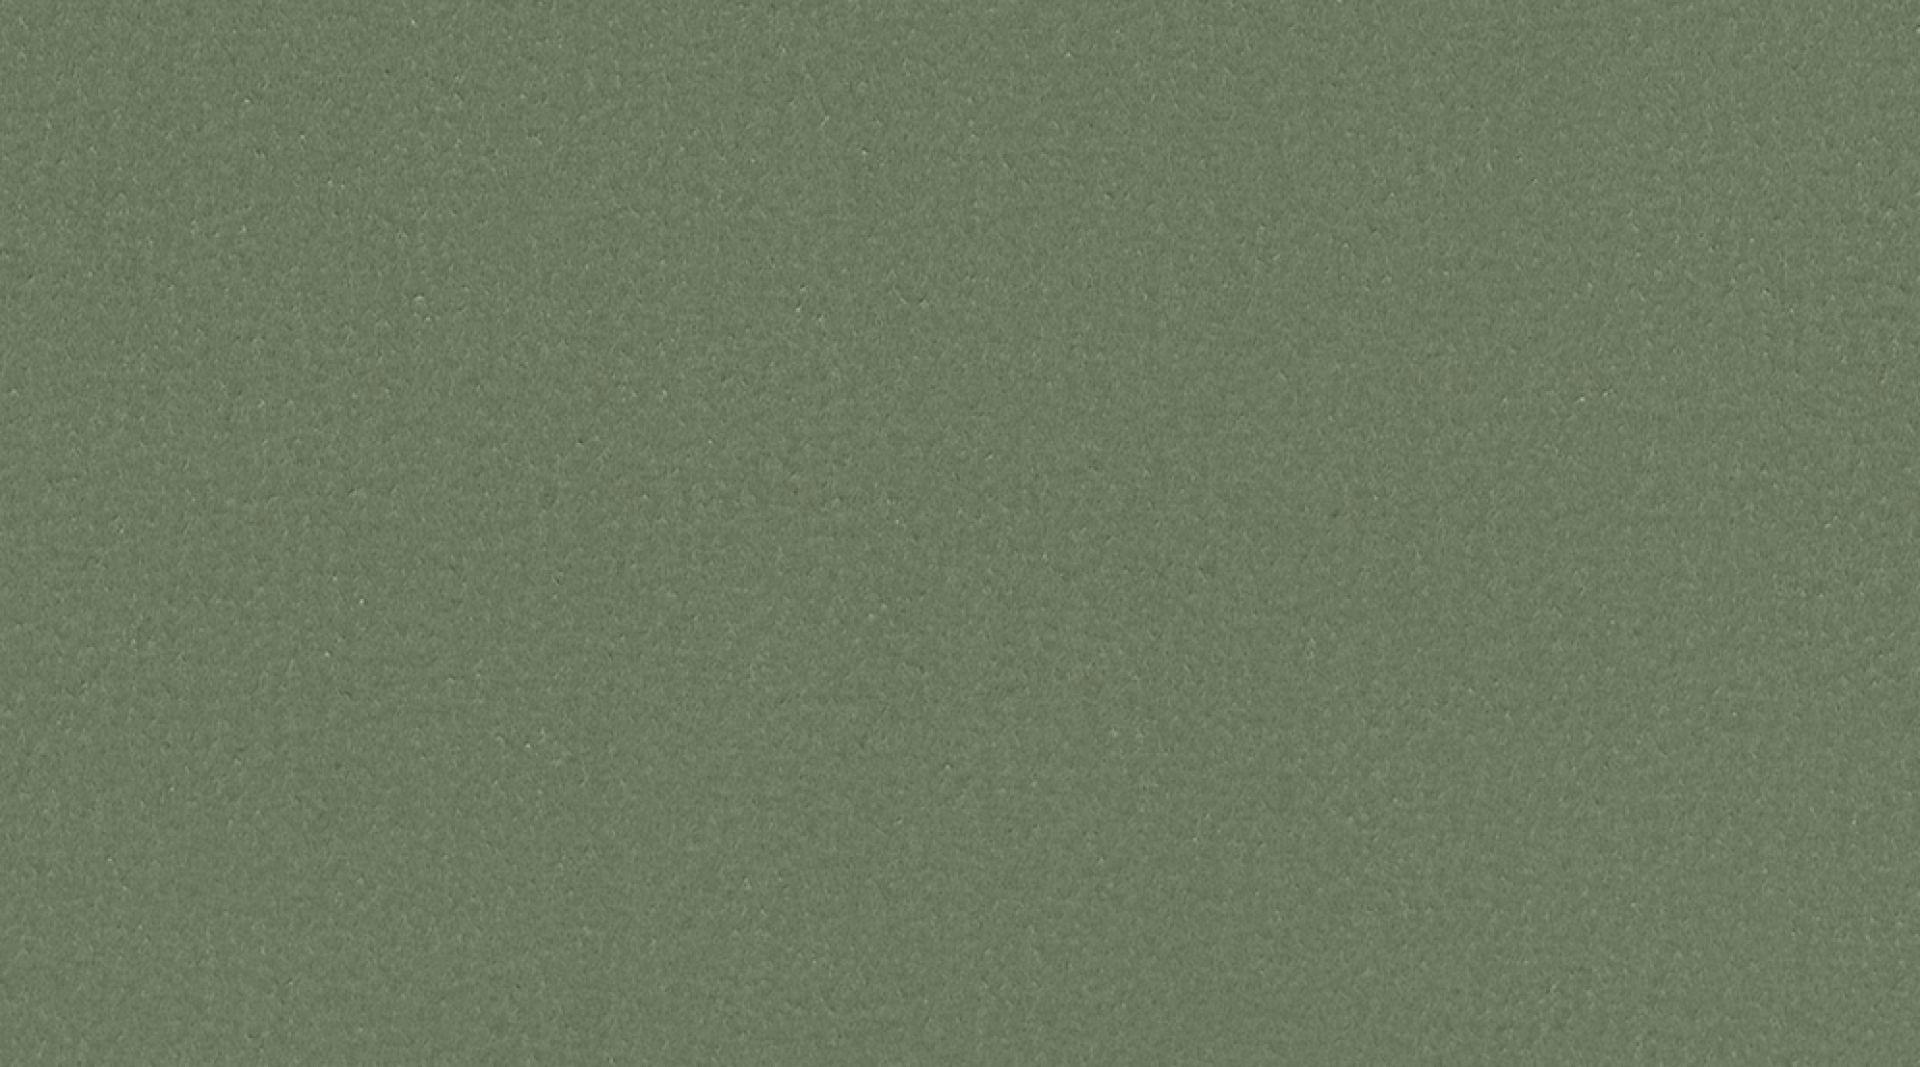 0842 olive